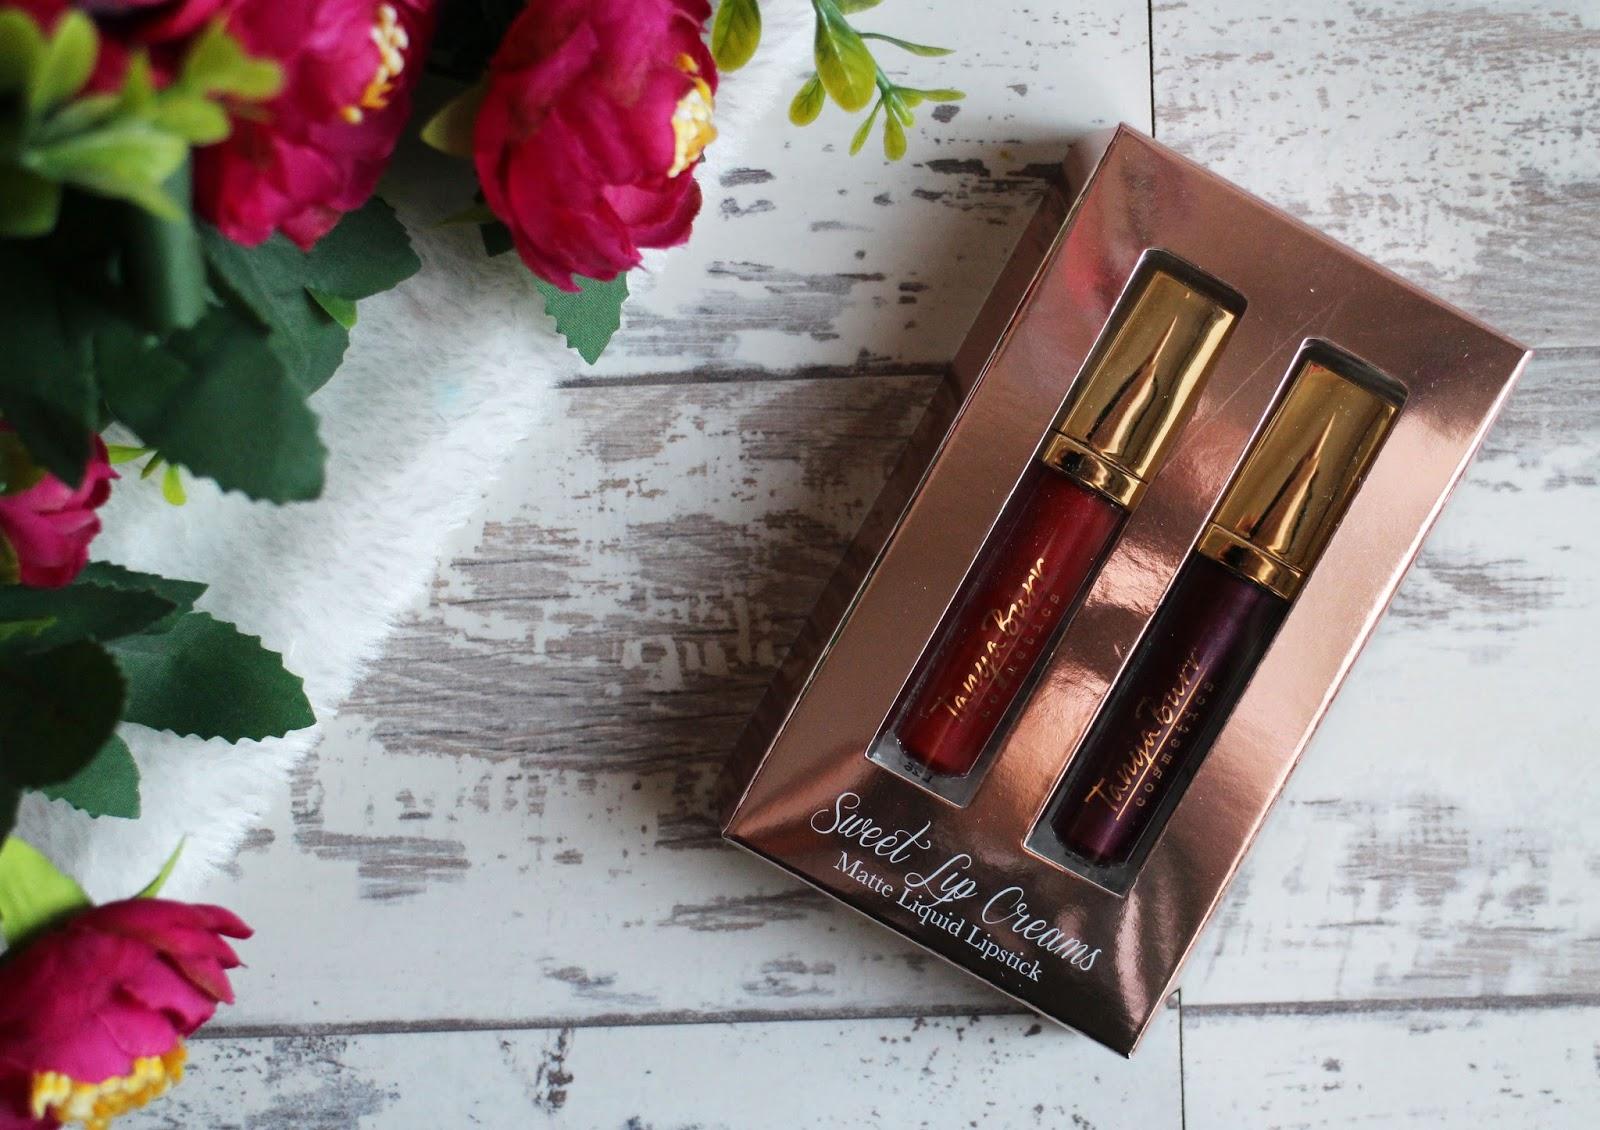 Tanya Burr Glow Du Cocoa & Sweet Lip Cream Gift Sets